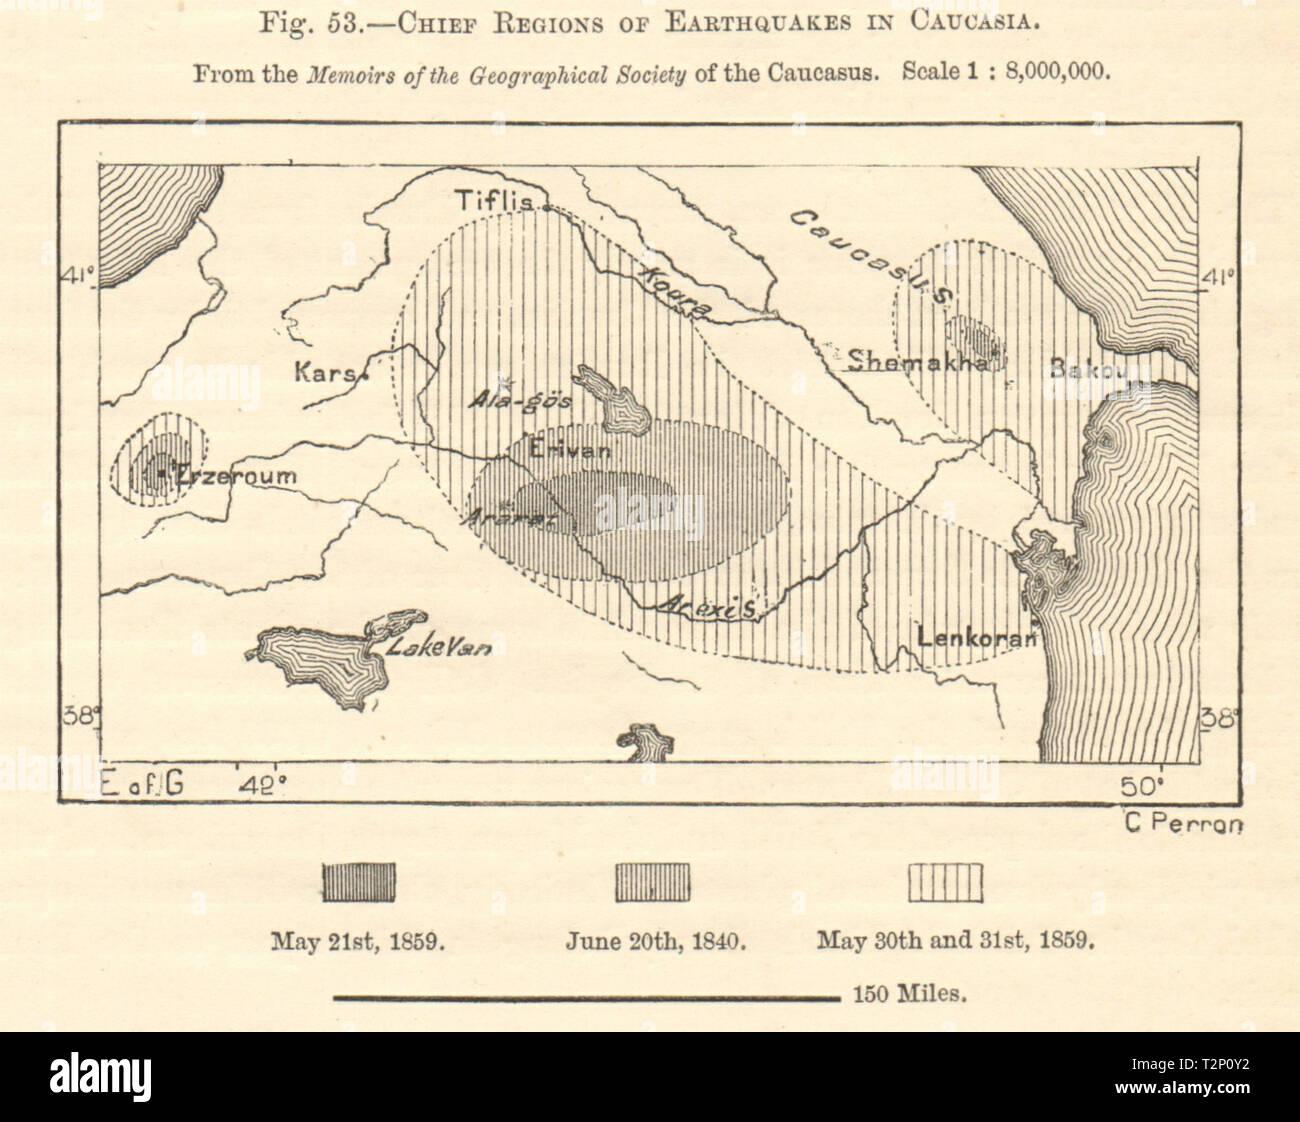 Caucasus 1840/59 earthquakes. Azerbaijan Armenia Georgia Turkey. Sketch map 1885 - Stock Image